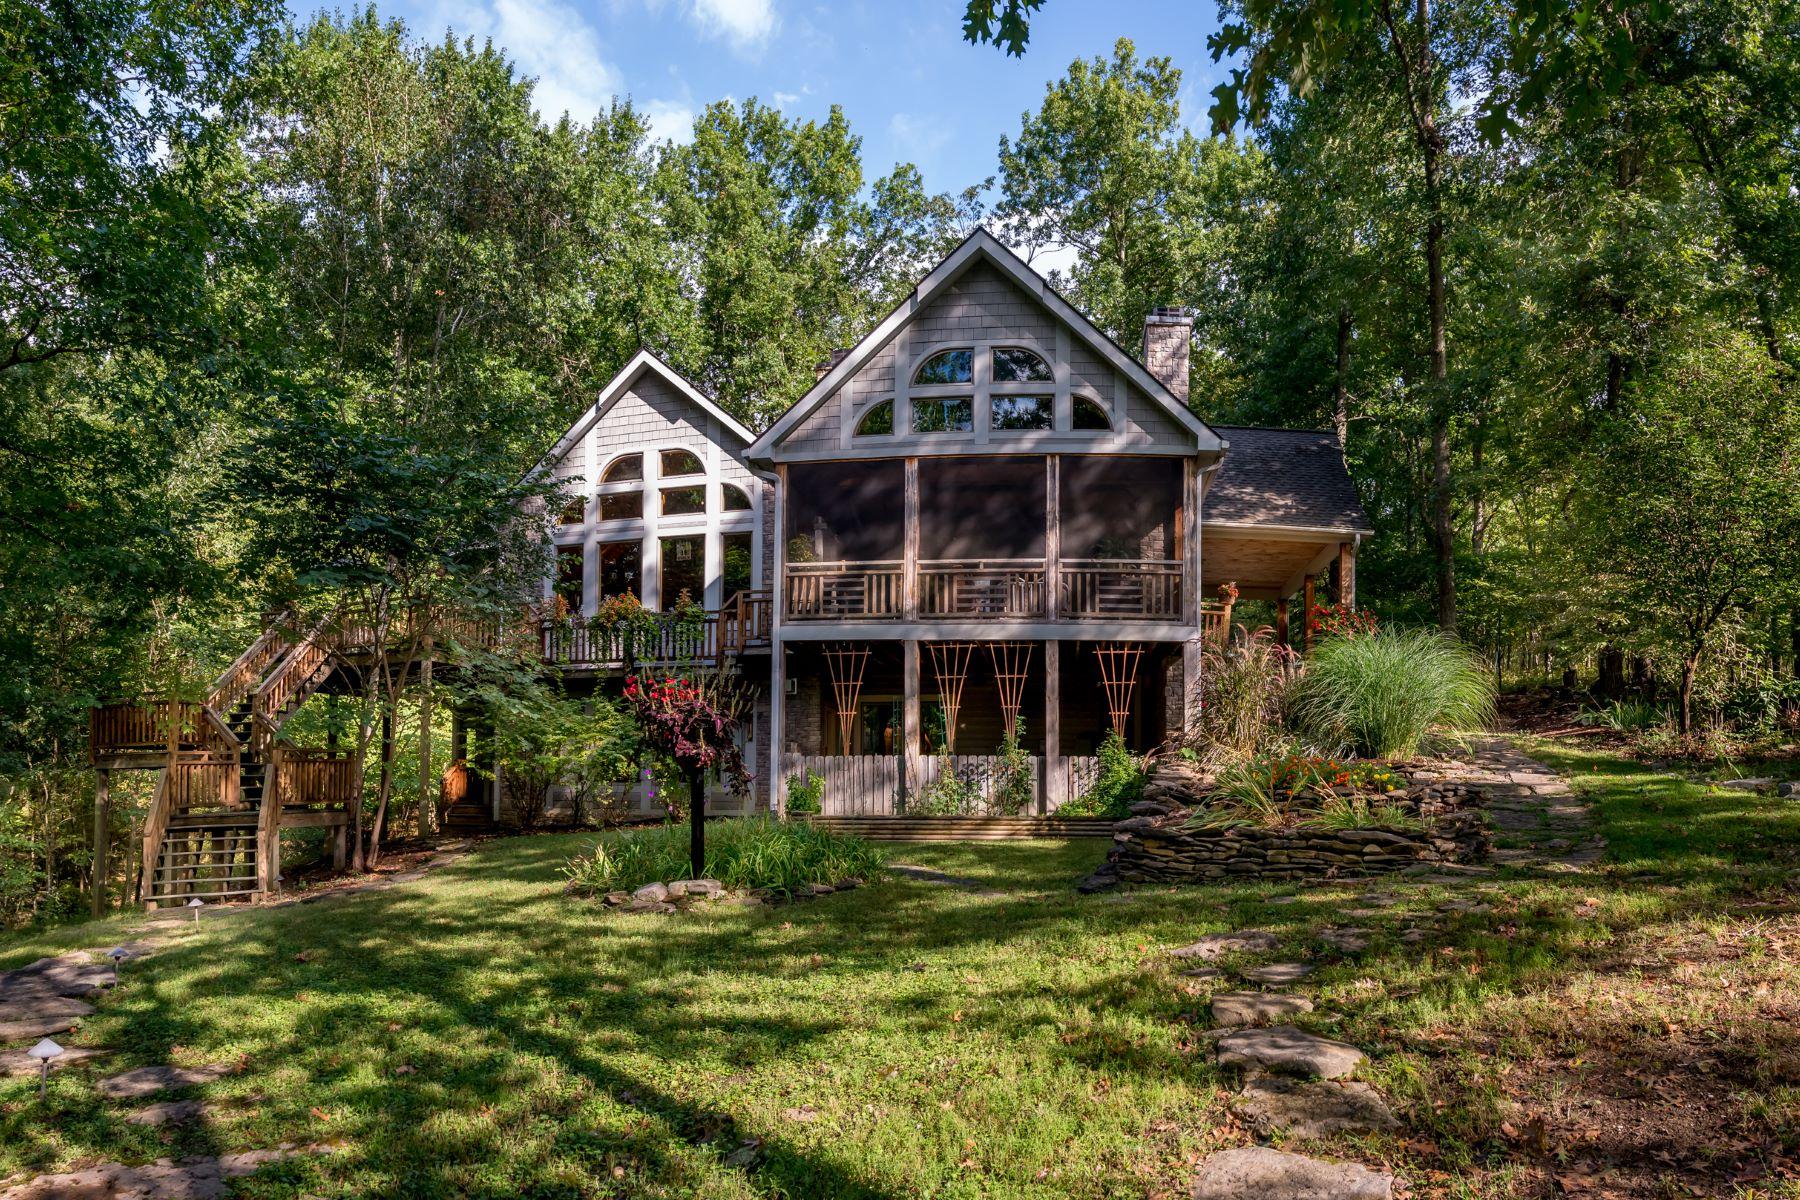 Single Family Home for Sale at 152 N. Deerlake Path 152 N. Deerlake Path Sadieville, Kentucky 40370 United States